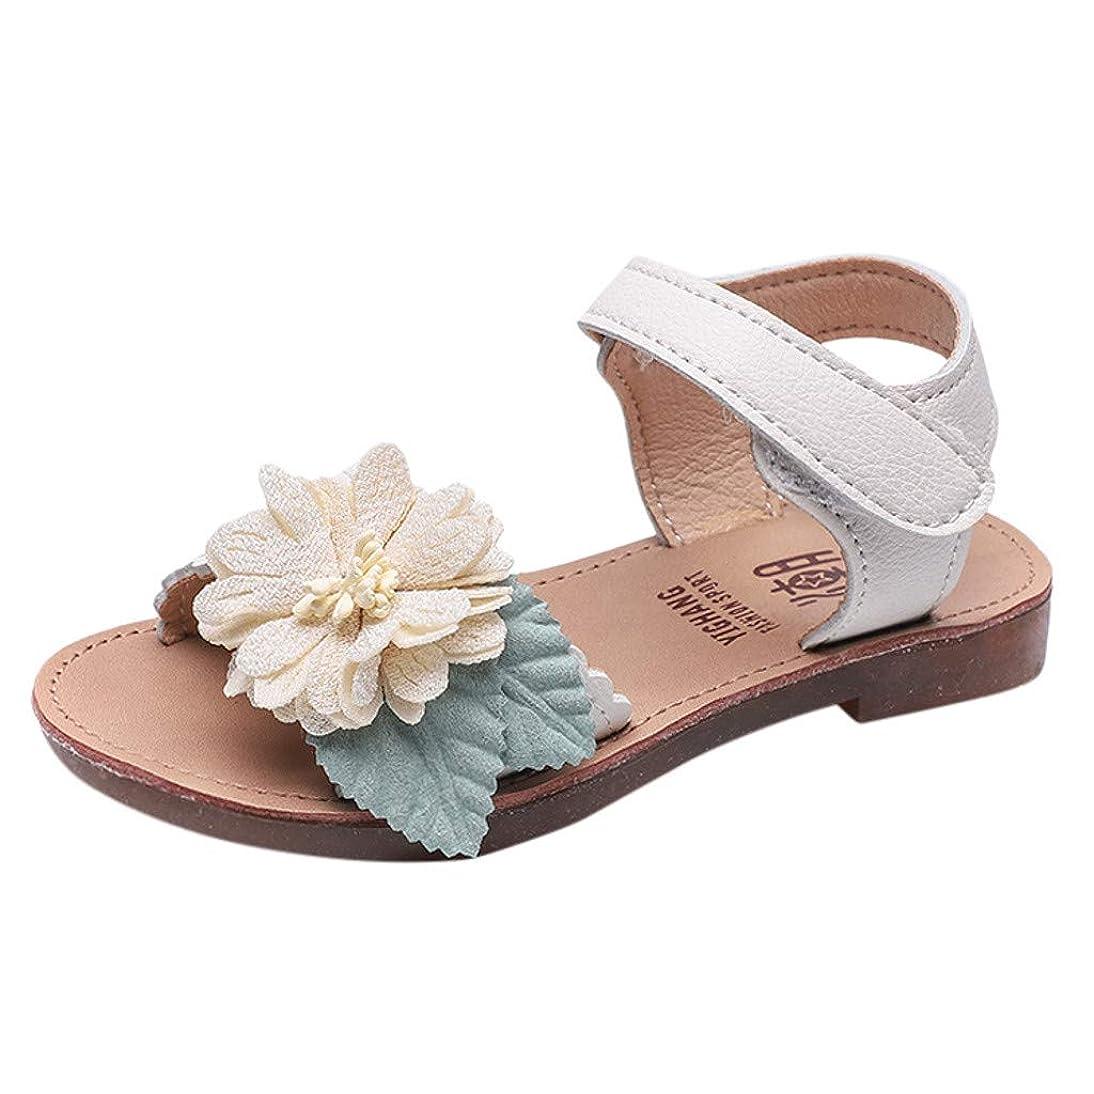 Tantisy ??? Kids Girls Cute Flower Open Toe Flat Strap Summer Sandals (Toddler/Little Kid/Big Kid) qptw564983950937